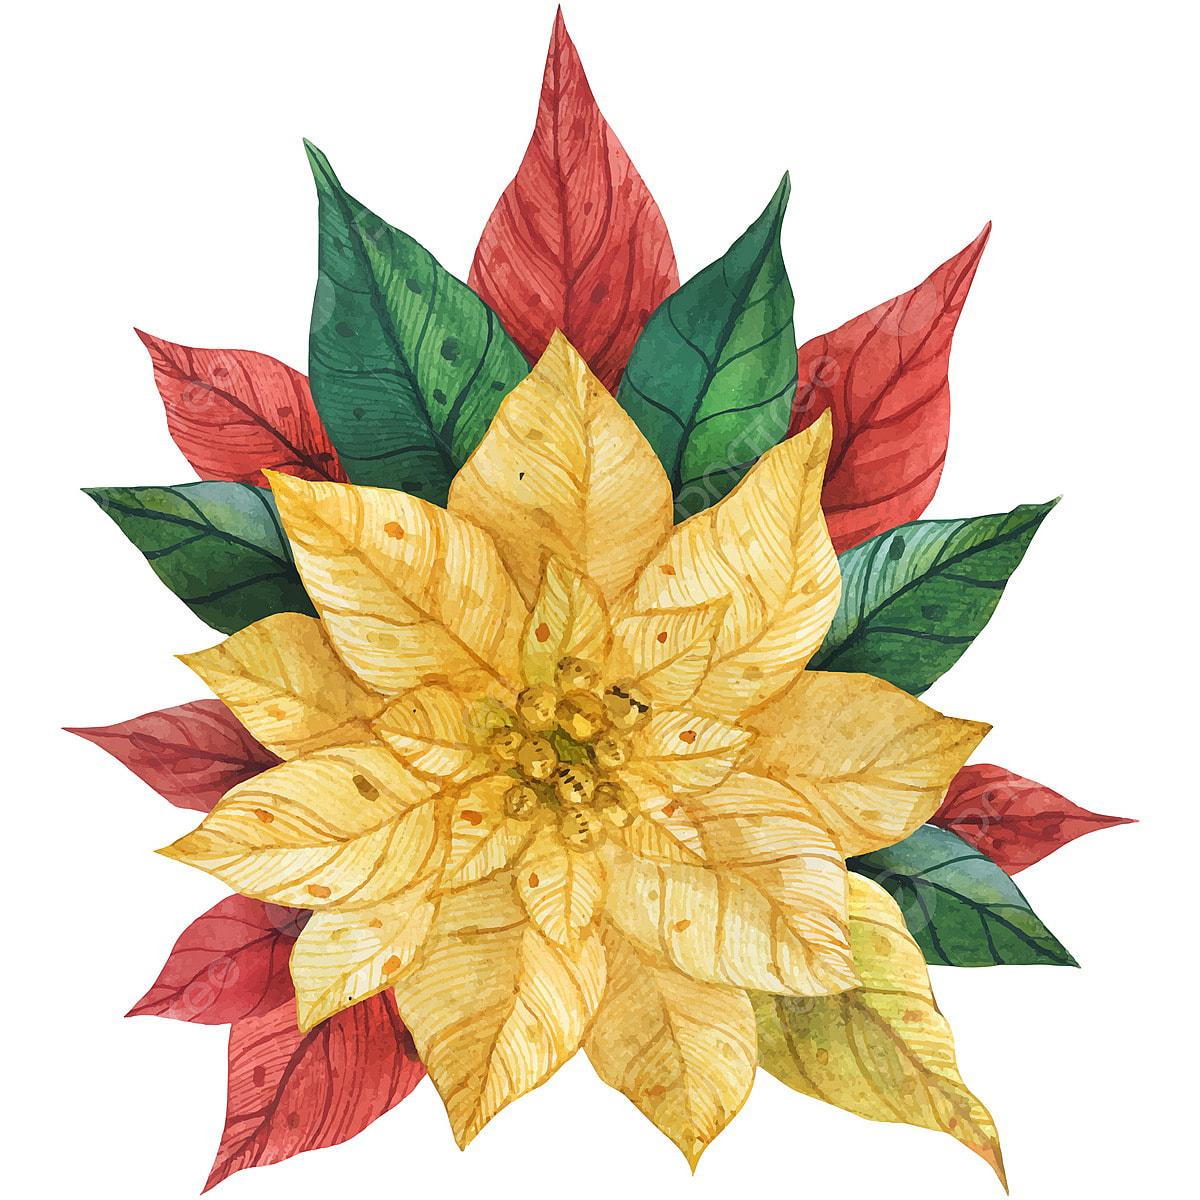 Poinsettia Clip Art, Transparent PNG Clipart Images Free Download -  ClipartMax